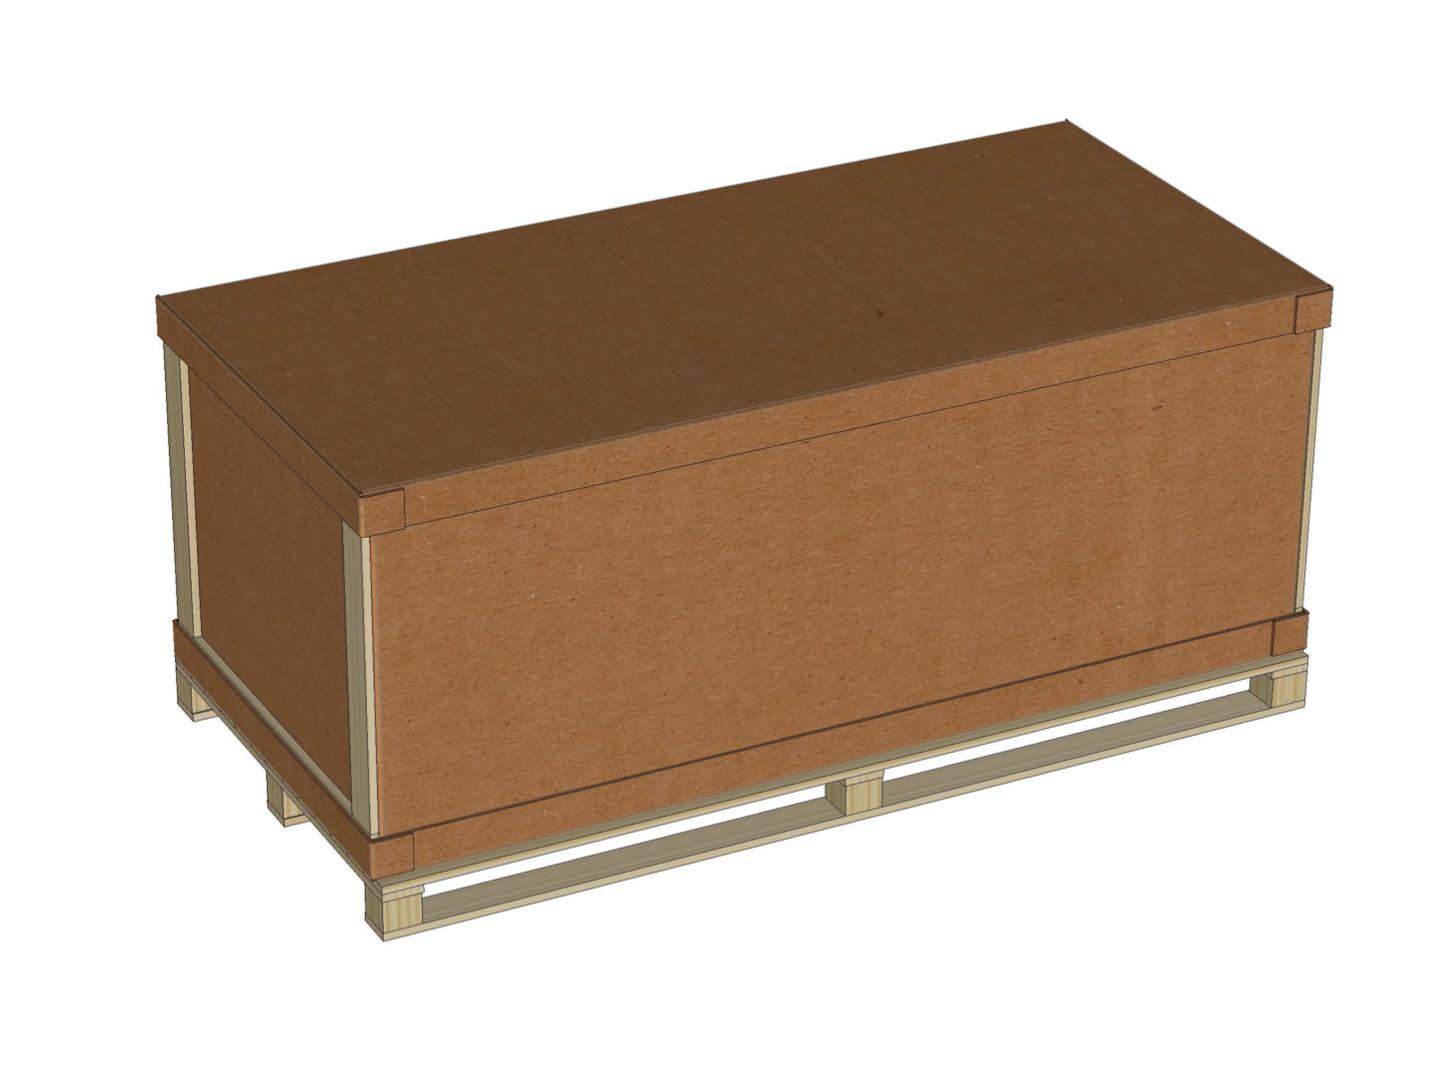 cajas de embalaje diseño 6